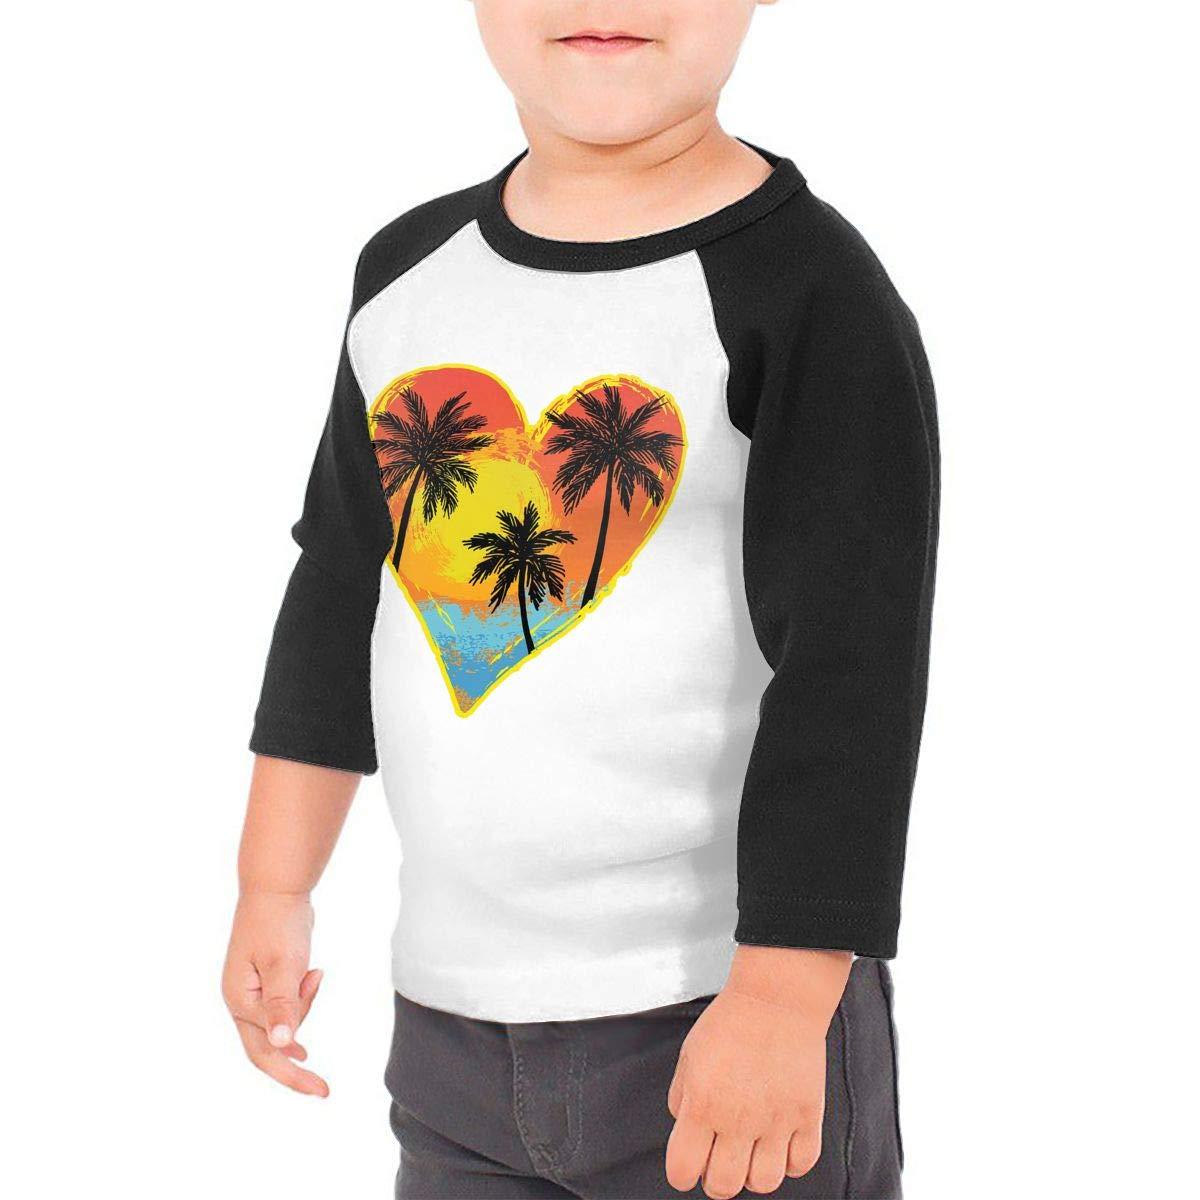 Yimo Beach Palm Tree Heart Unisex Toddler Baseball Jersey Contrast 3//4 Sleeves Tee